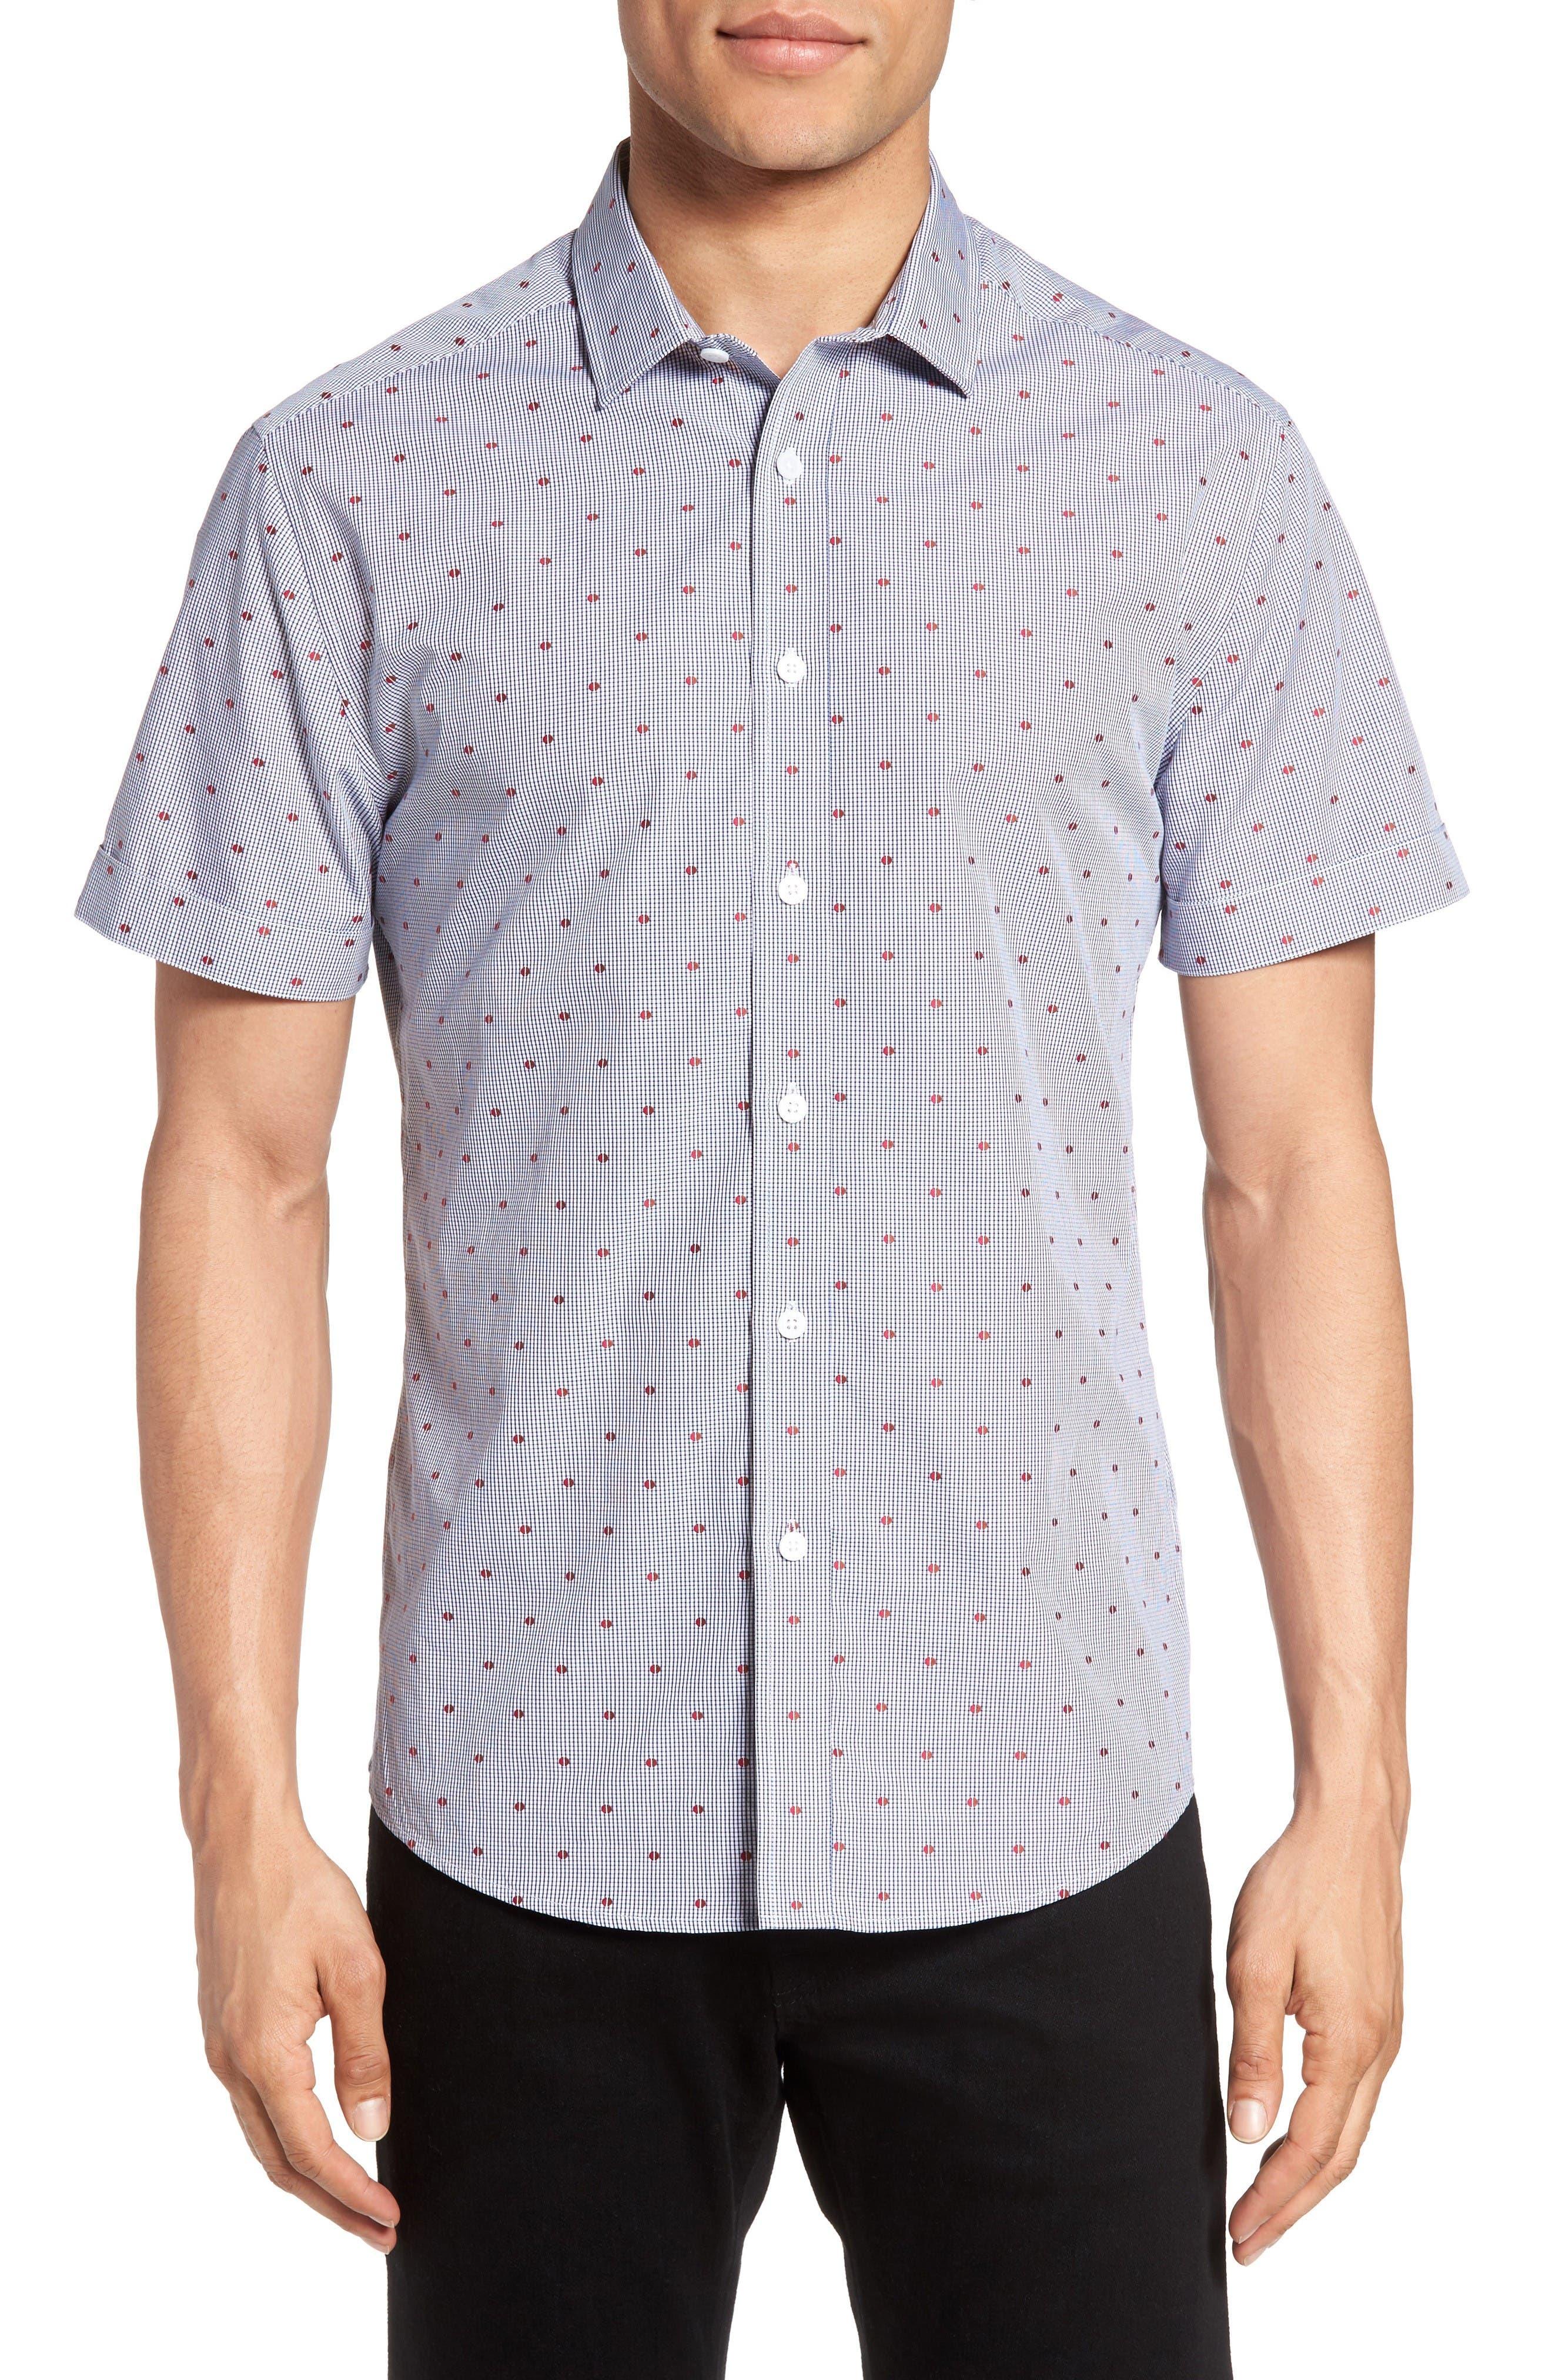 Short Sleeve Sport Shirt,                             Main thumbnail 1, color,                             230